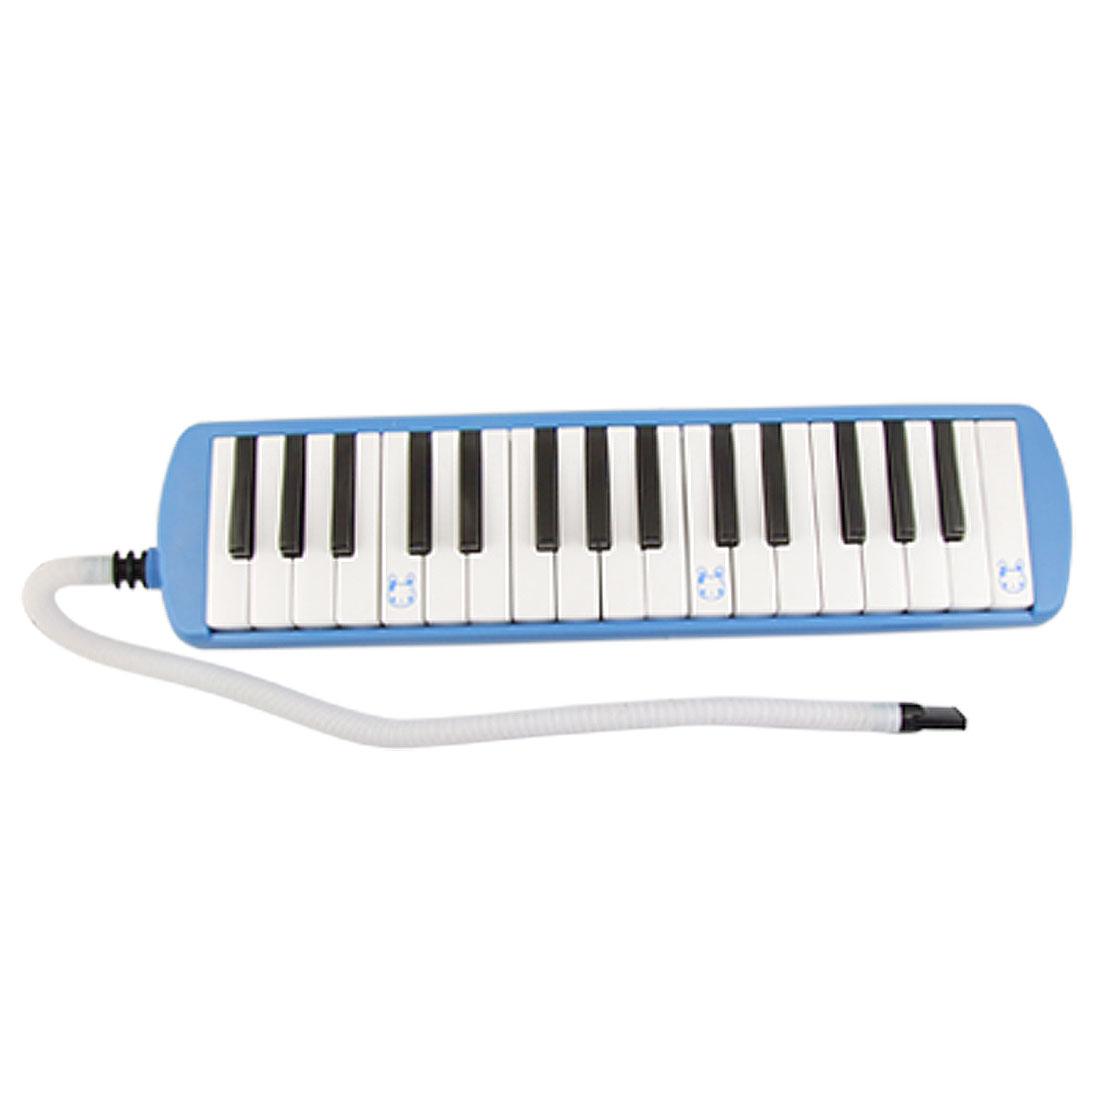 White Black Plastic 32 Key Piano Keyborad Melodica Blue w Mouthpiece